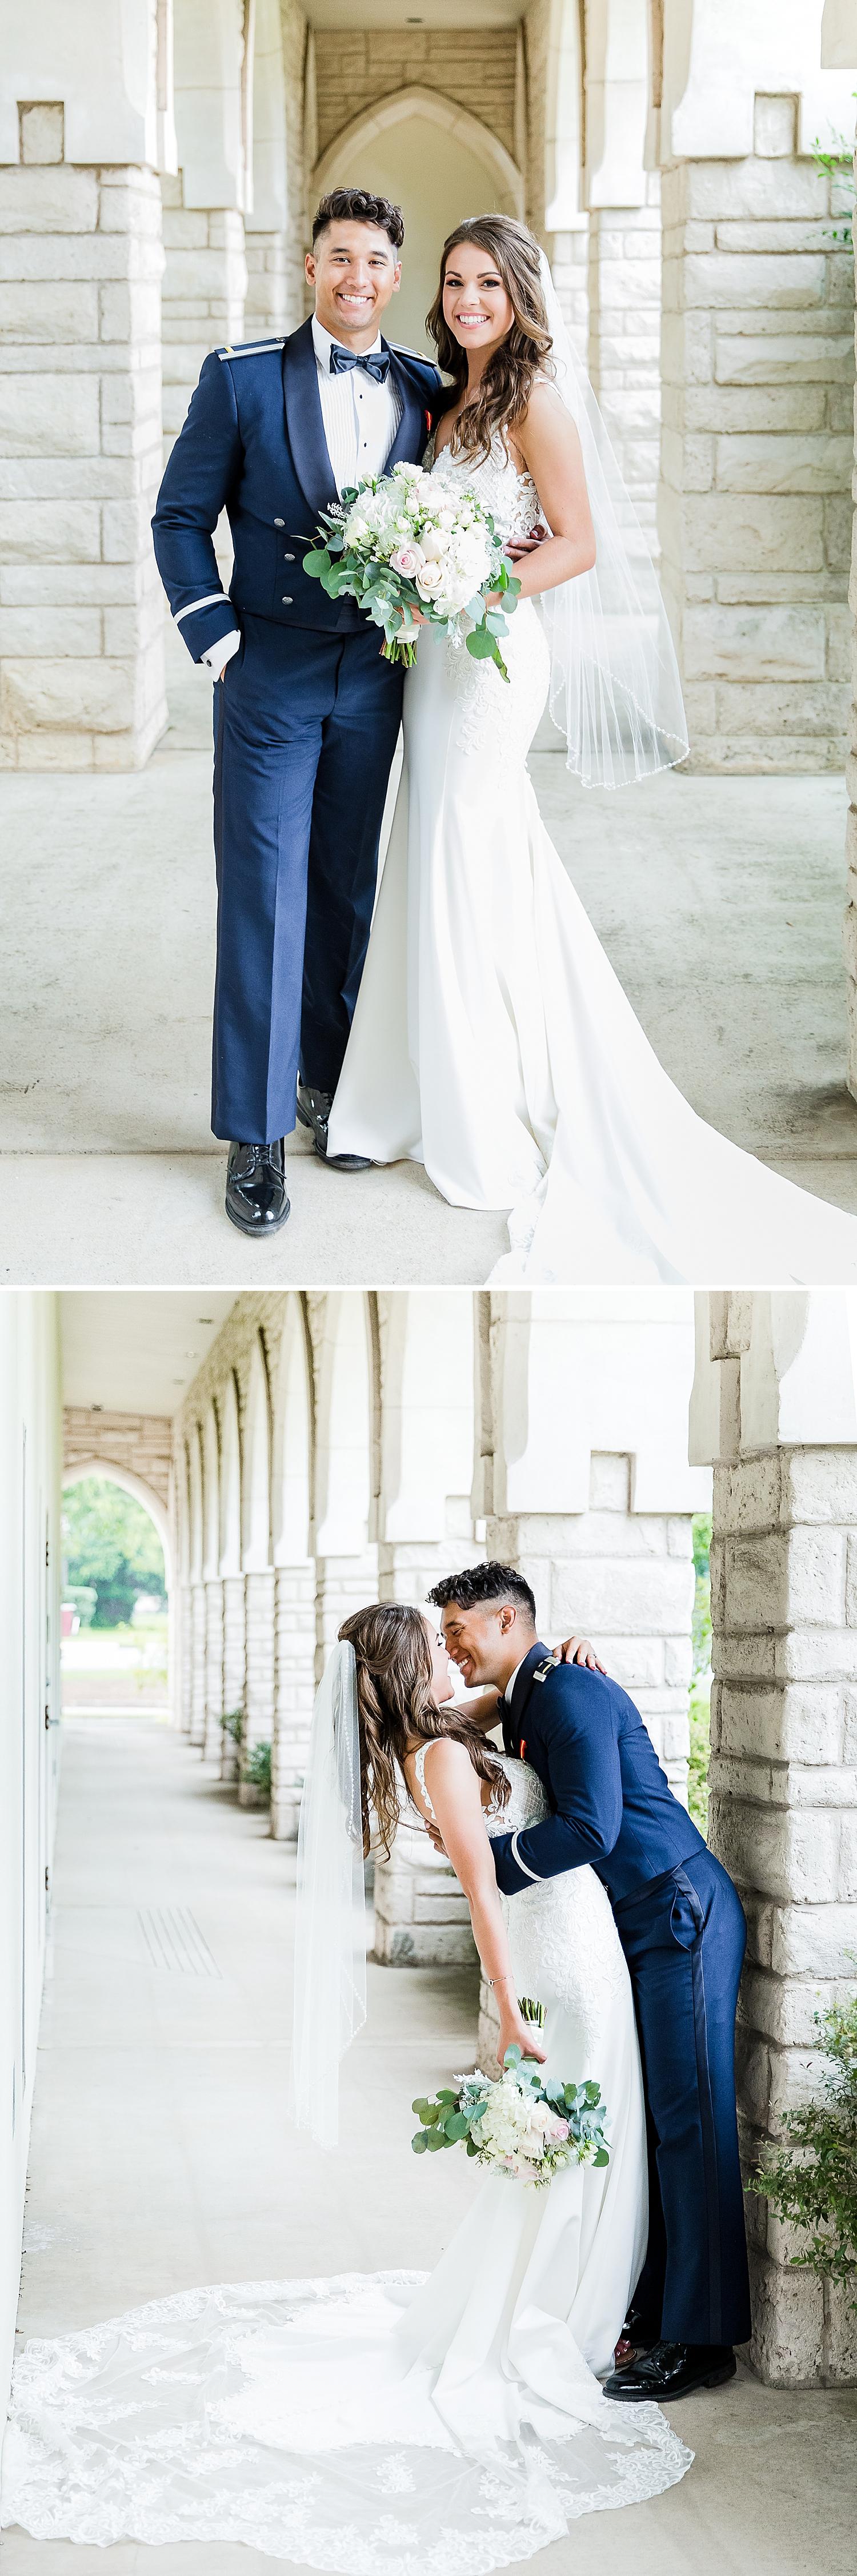 Military-AIr-Force-Wedding-Seguin-LaVernia-Texas-Carly-Barton-Photography_0077.jpg